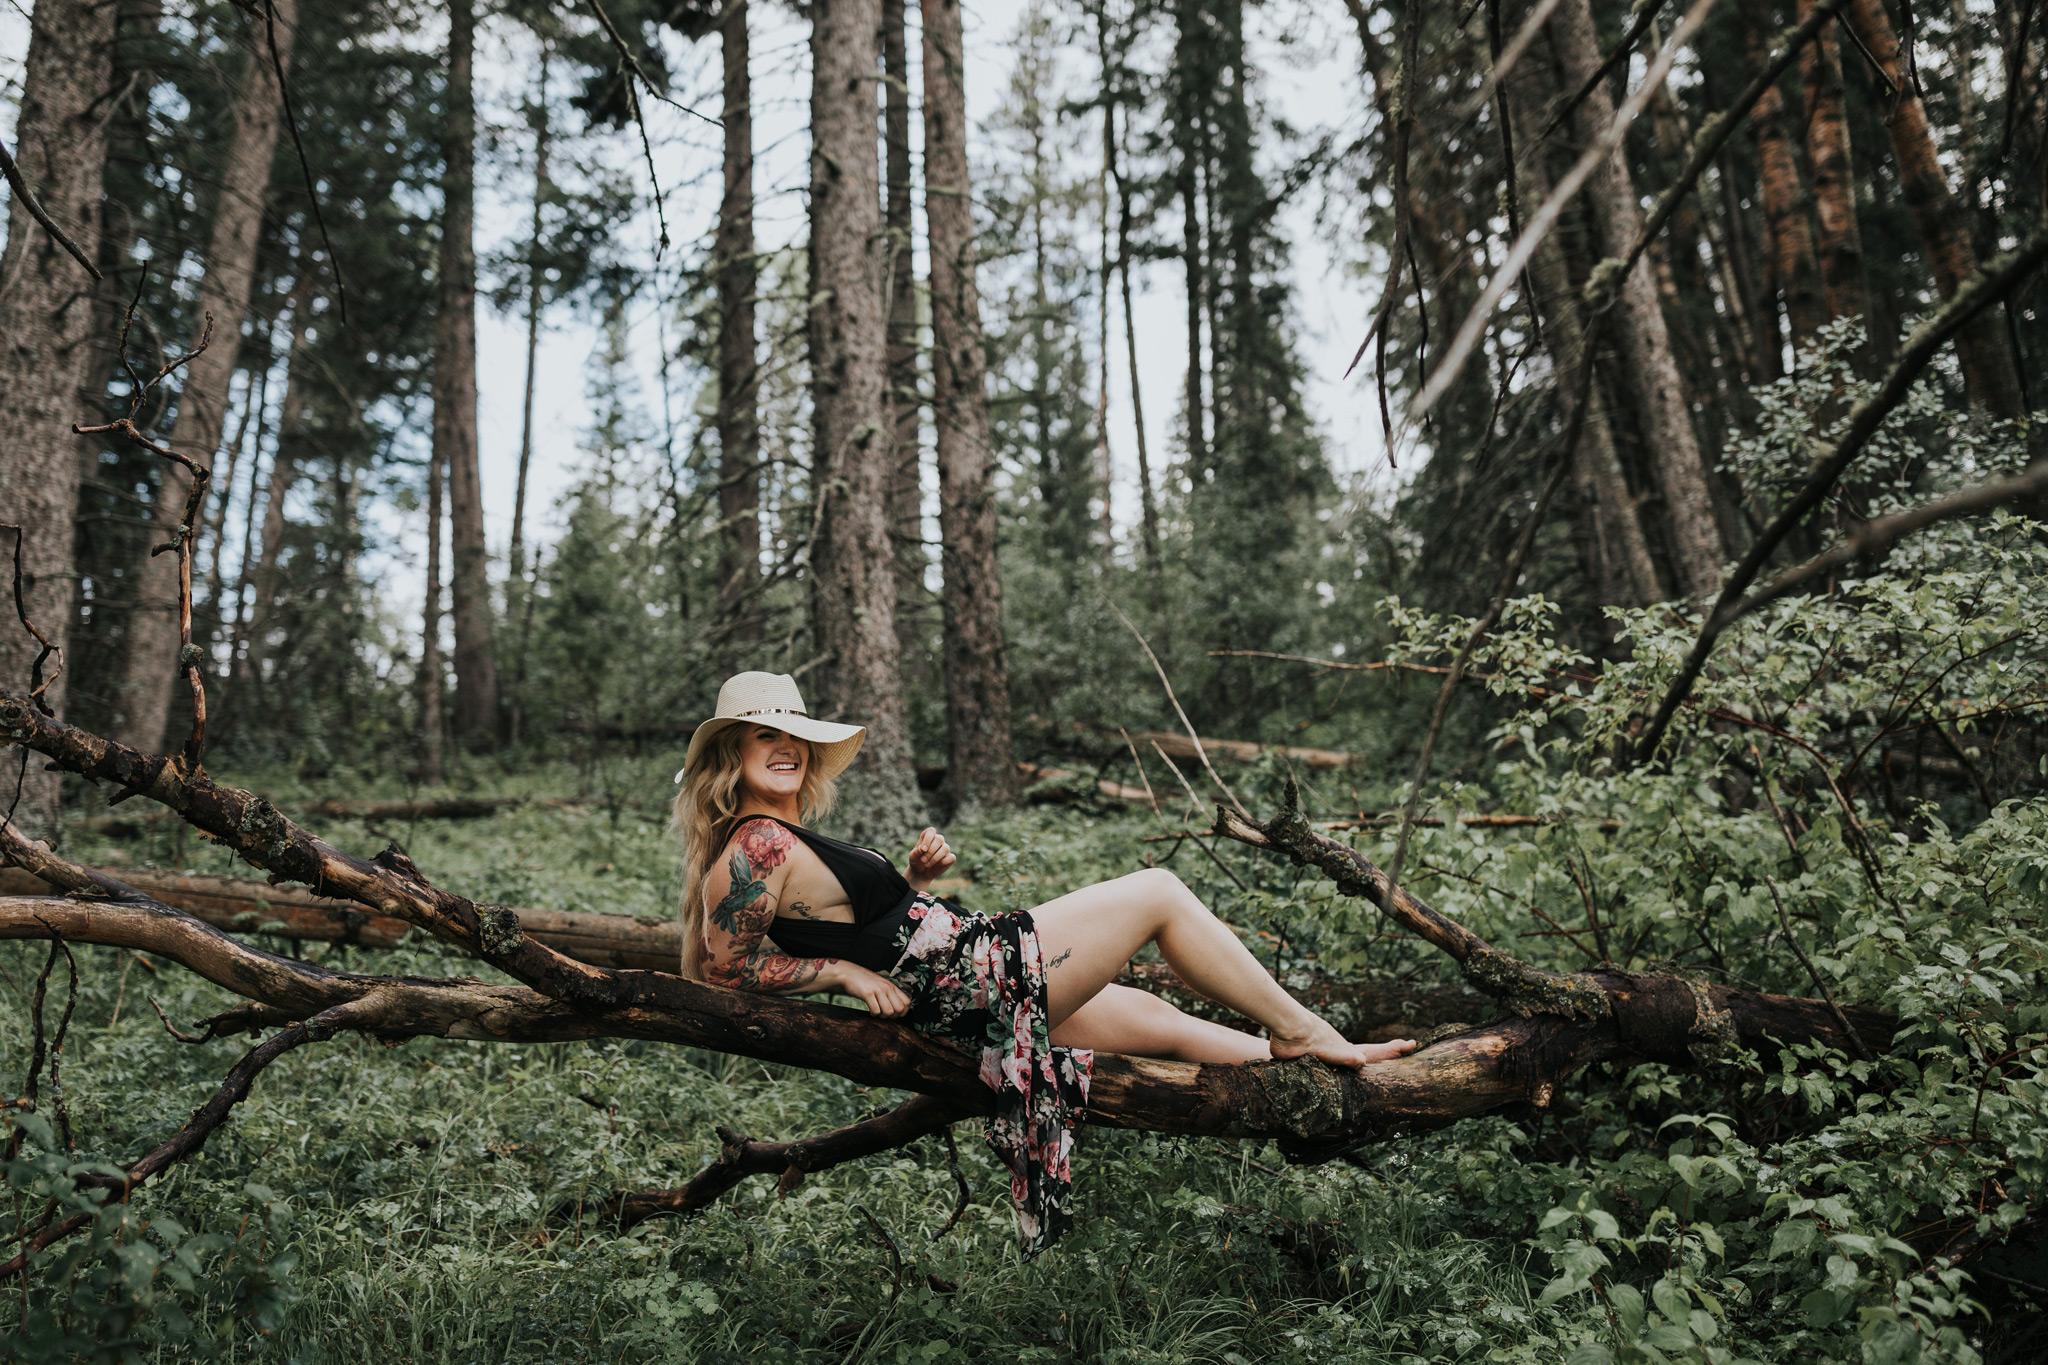 woman lounging on suspended tree log laughing elkwater alberta